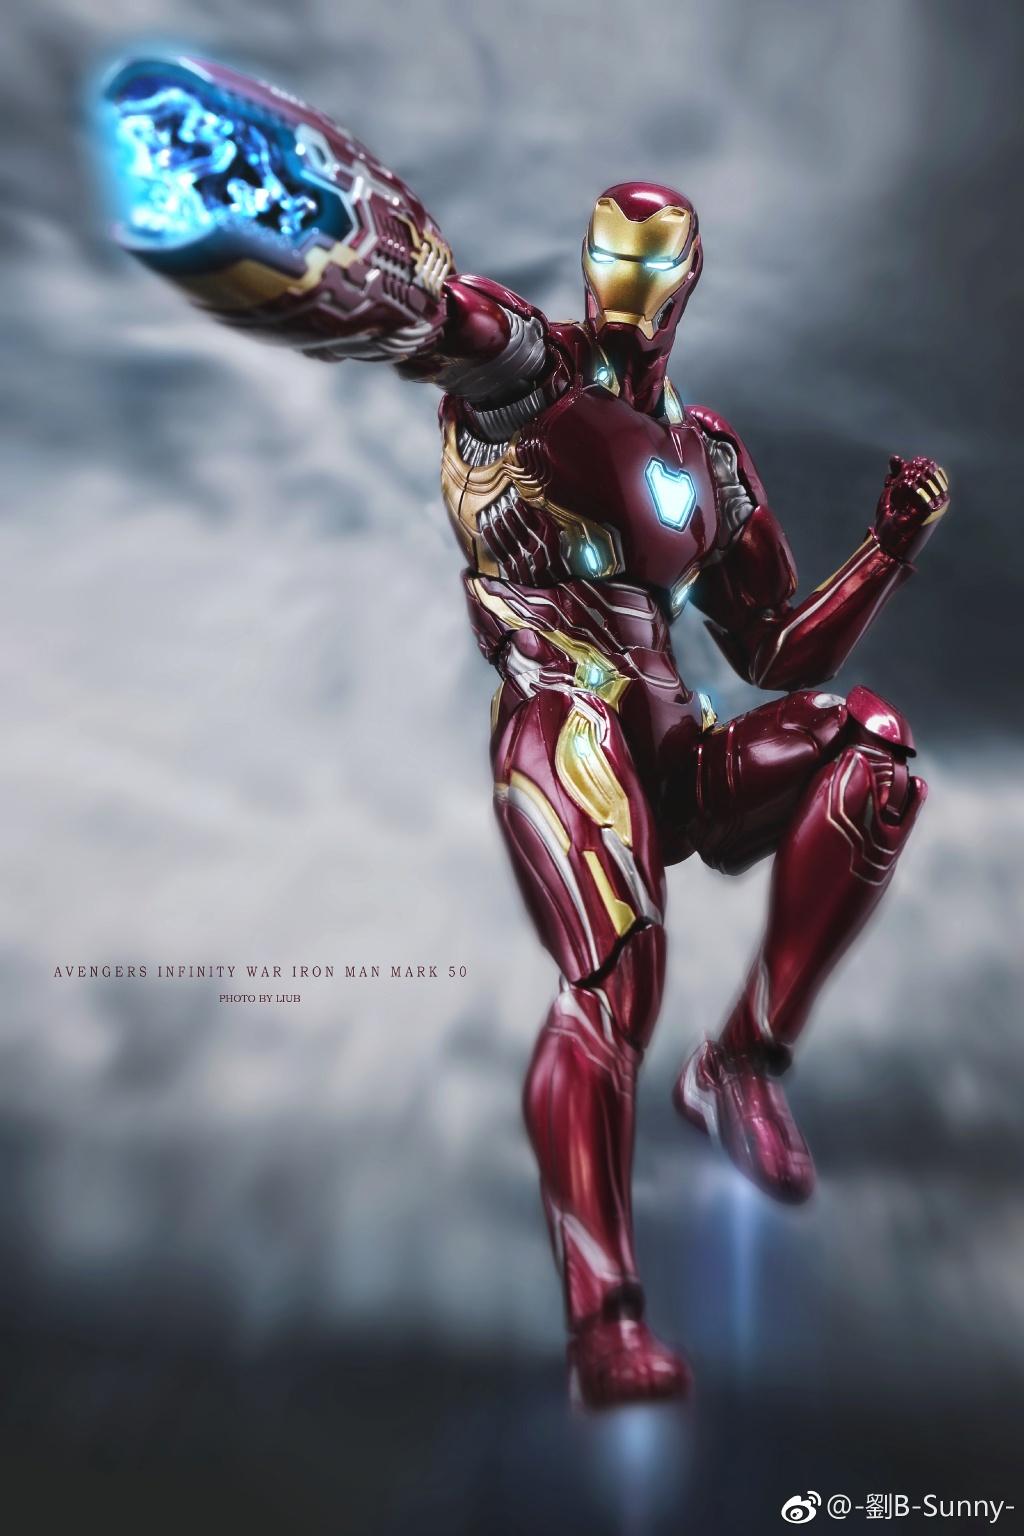 Iron Man (S.H.Figuarts) - Page 17 P2nPzQaD_o